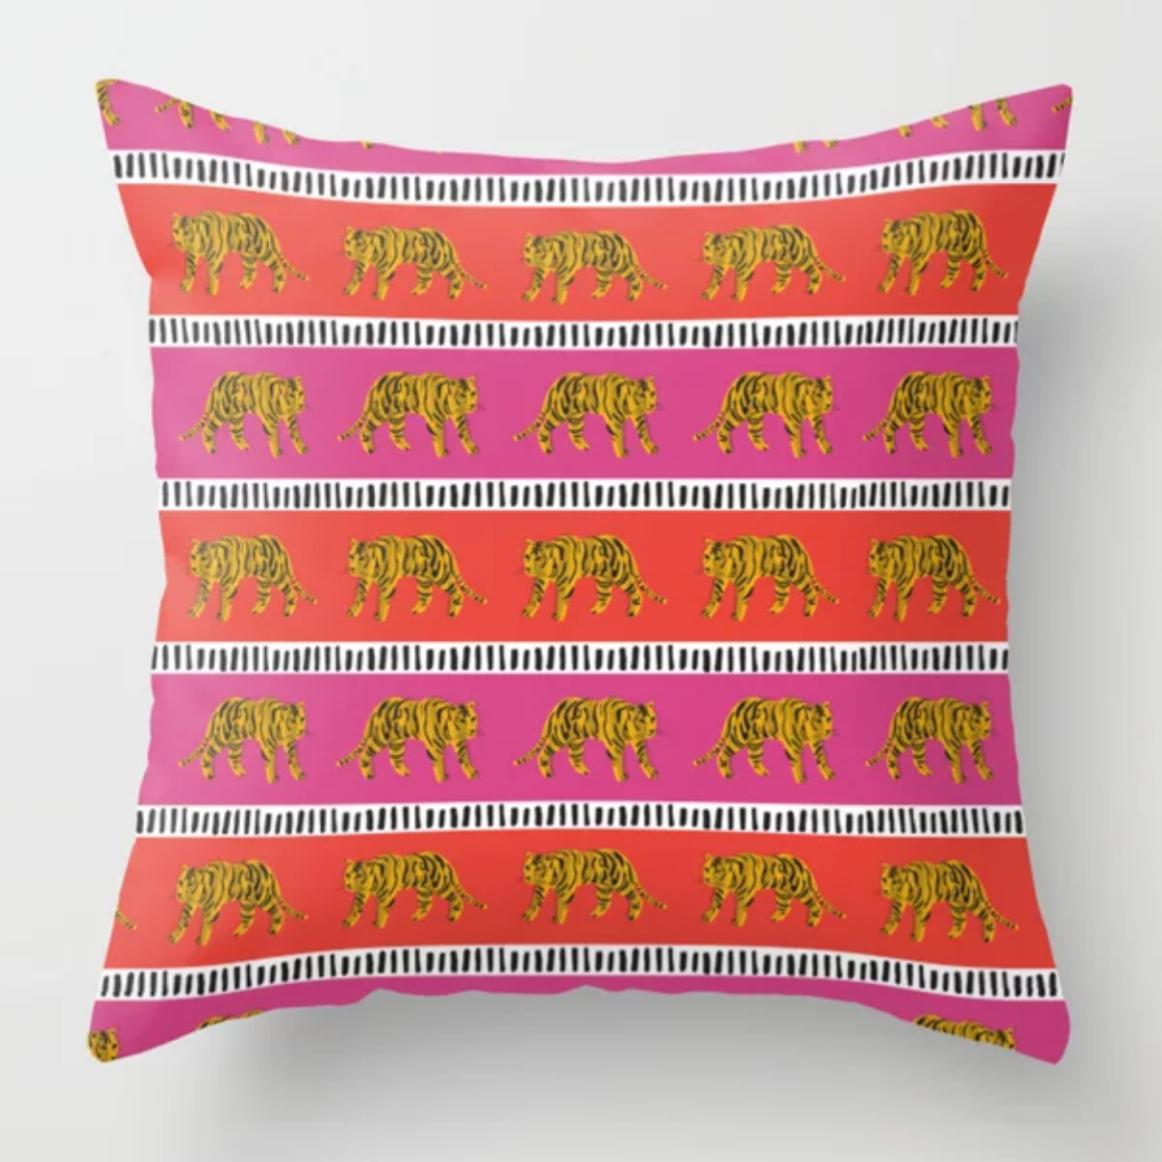 tiger-stripes-pillow-1.png